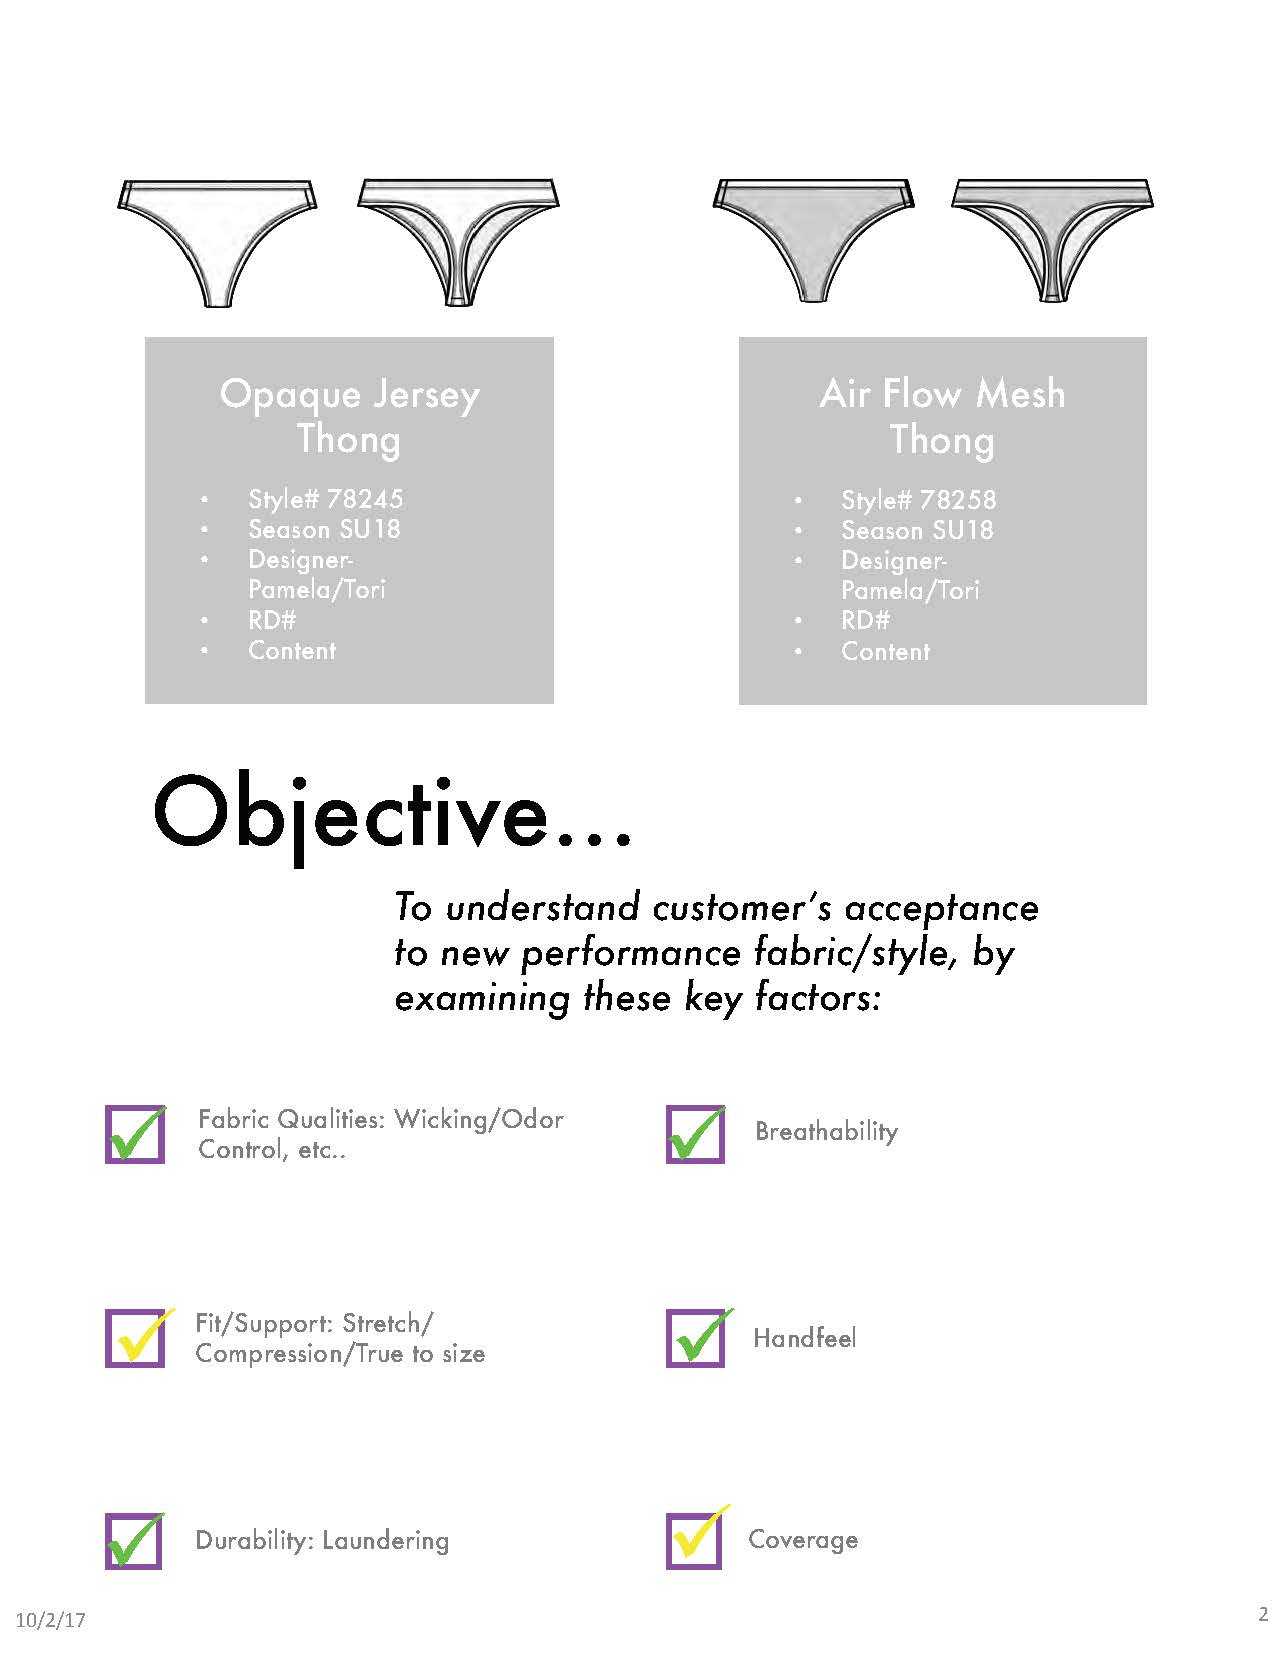 Underwear Thong Wear Test Executive Summary Report  2.jpg